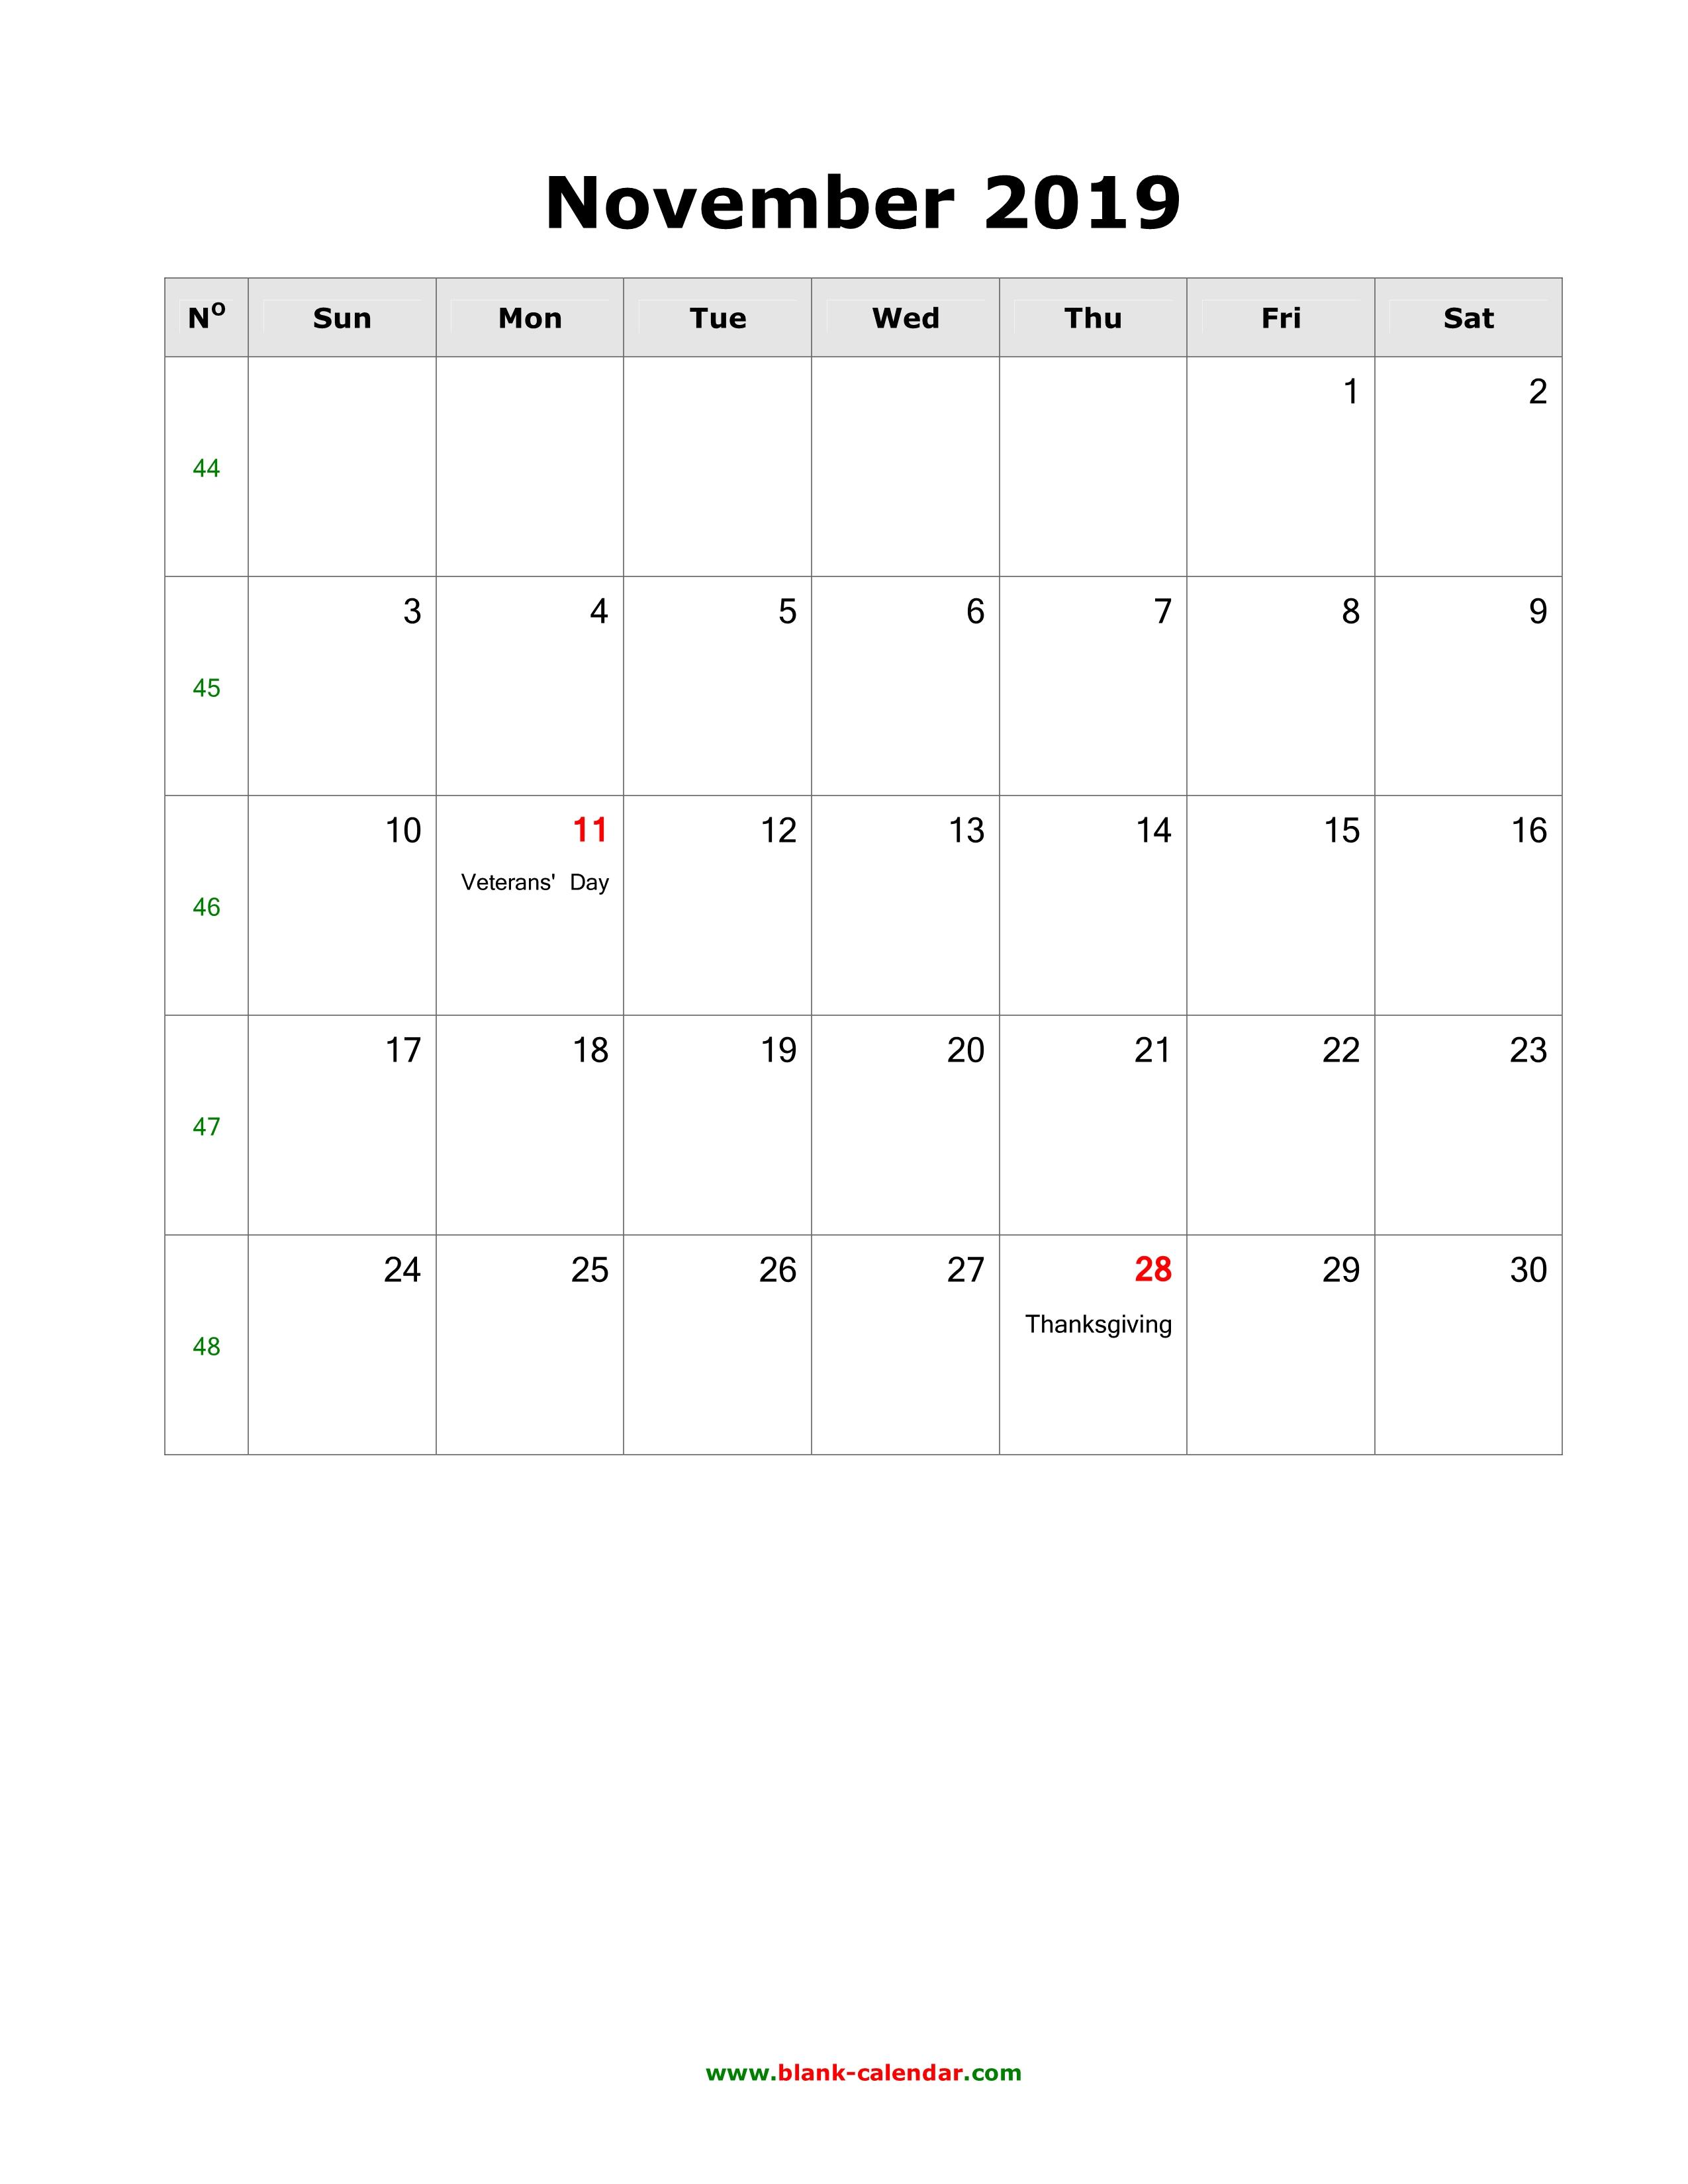 2019 Calendar With Holidays November And December Download November 2019 Blank Calendar with US Holidays (vertical)